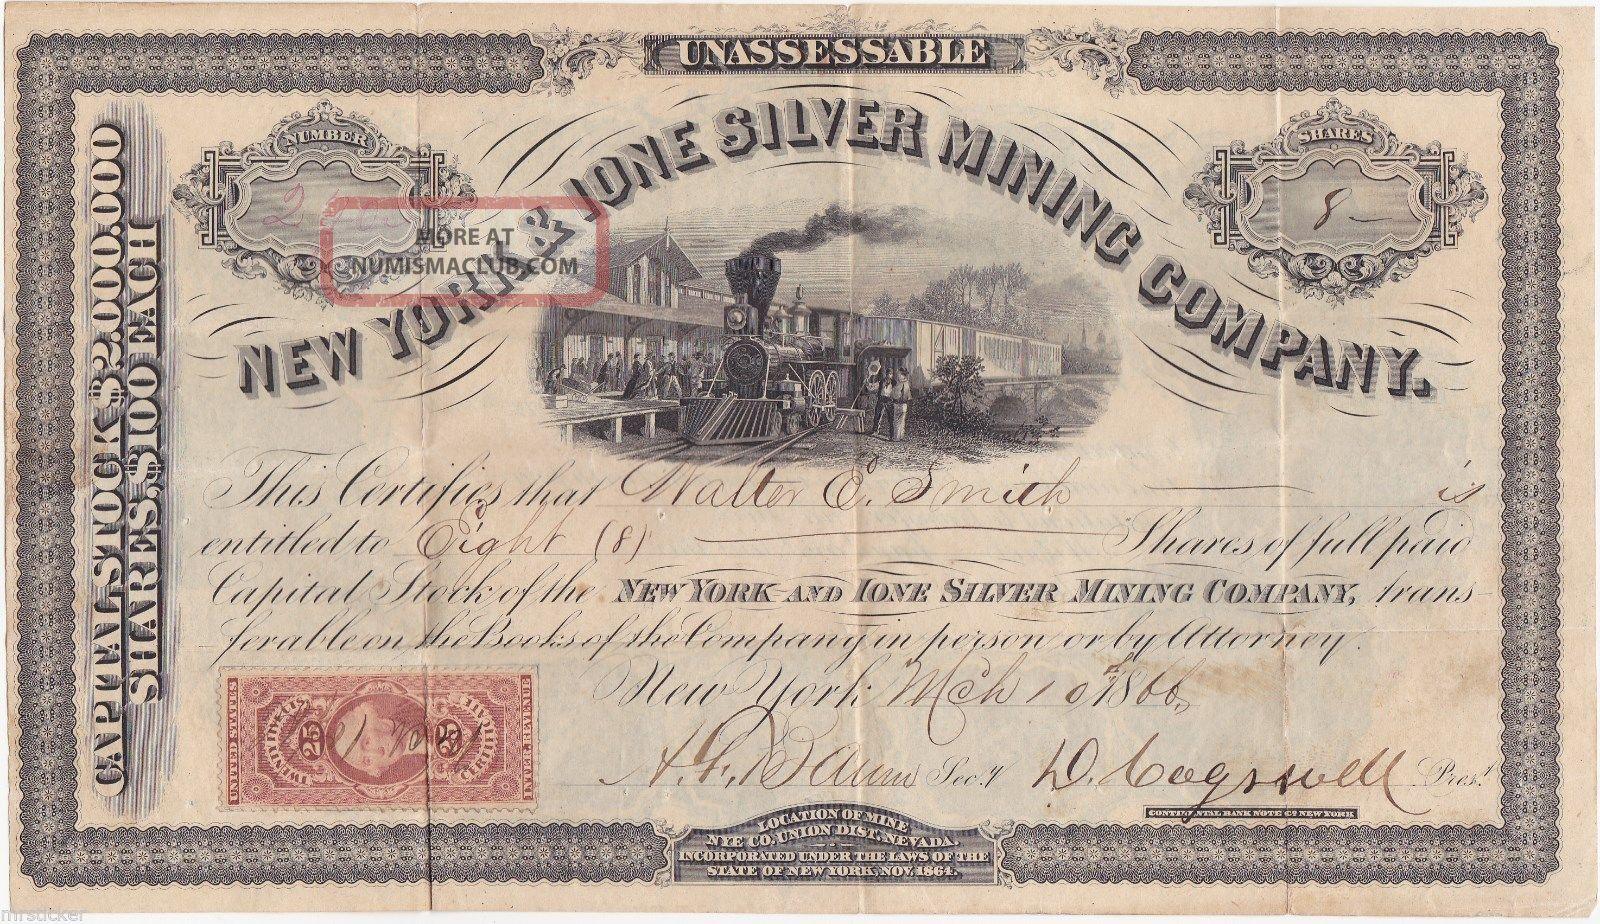 York & Ione Silver Mining Company Stock Certificate. Stocks & Bonds, Scripophily photo